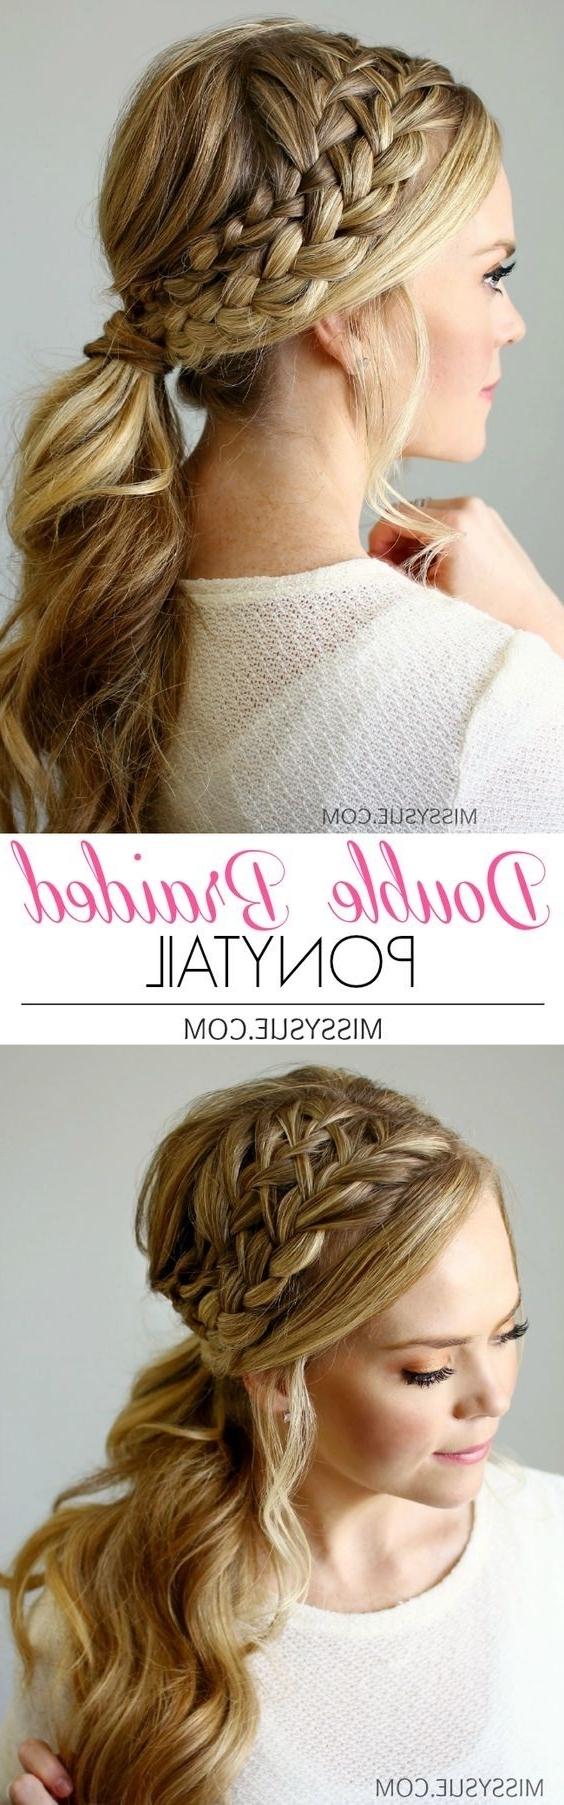 Cute Short Hair Ponytails 2018 Hair Styles 15 Cute And Easy